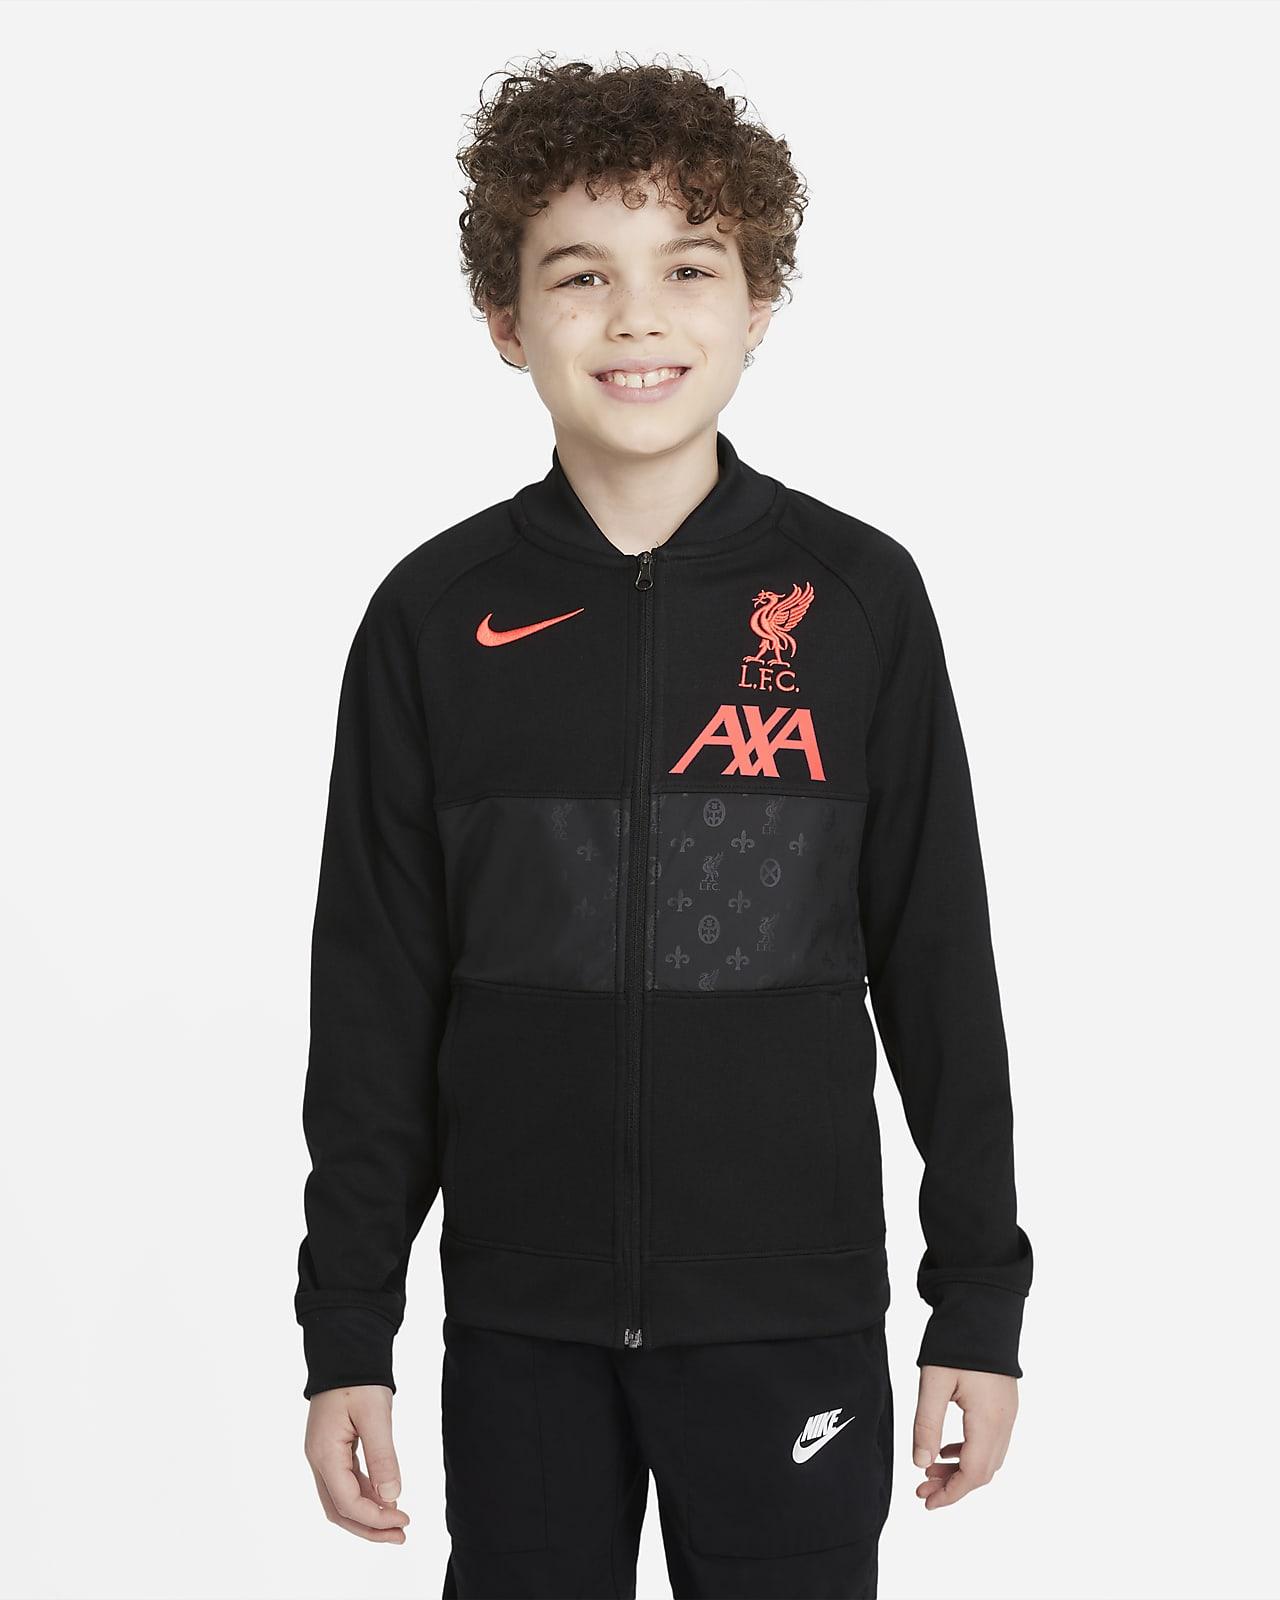 Liverpool FC Tam Boy Fermuarlı Genç Çocuk Futbol Antrenman Ceketi